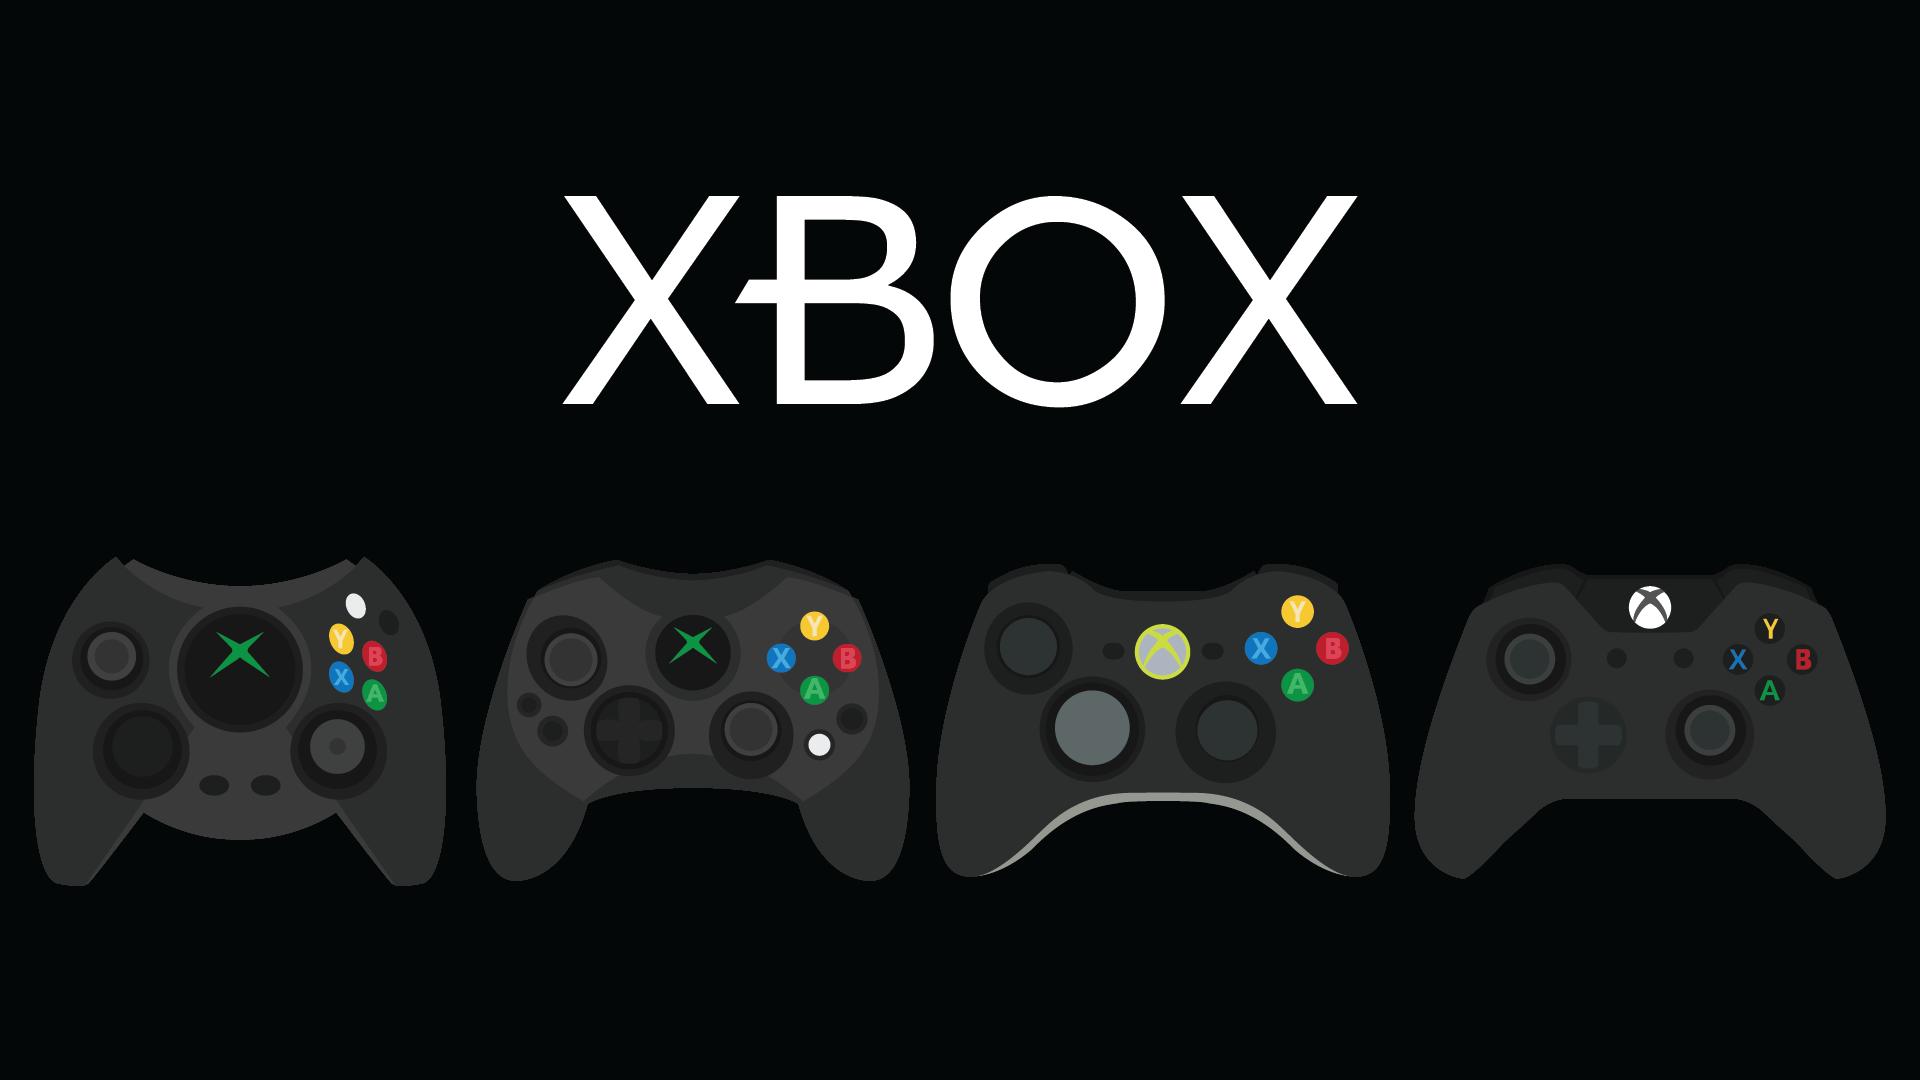 Xbox Wallpaper 18 1920 x 1080